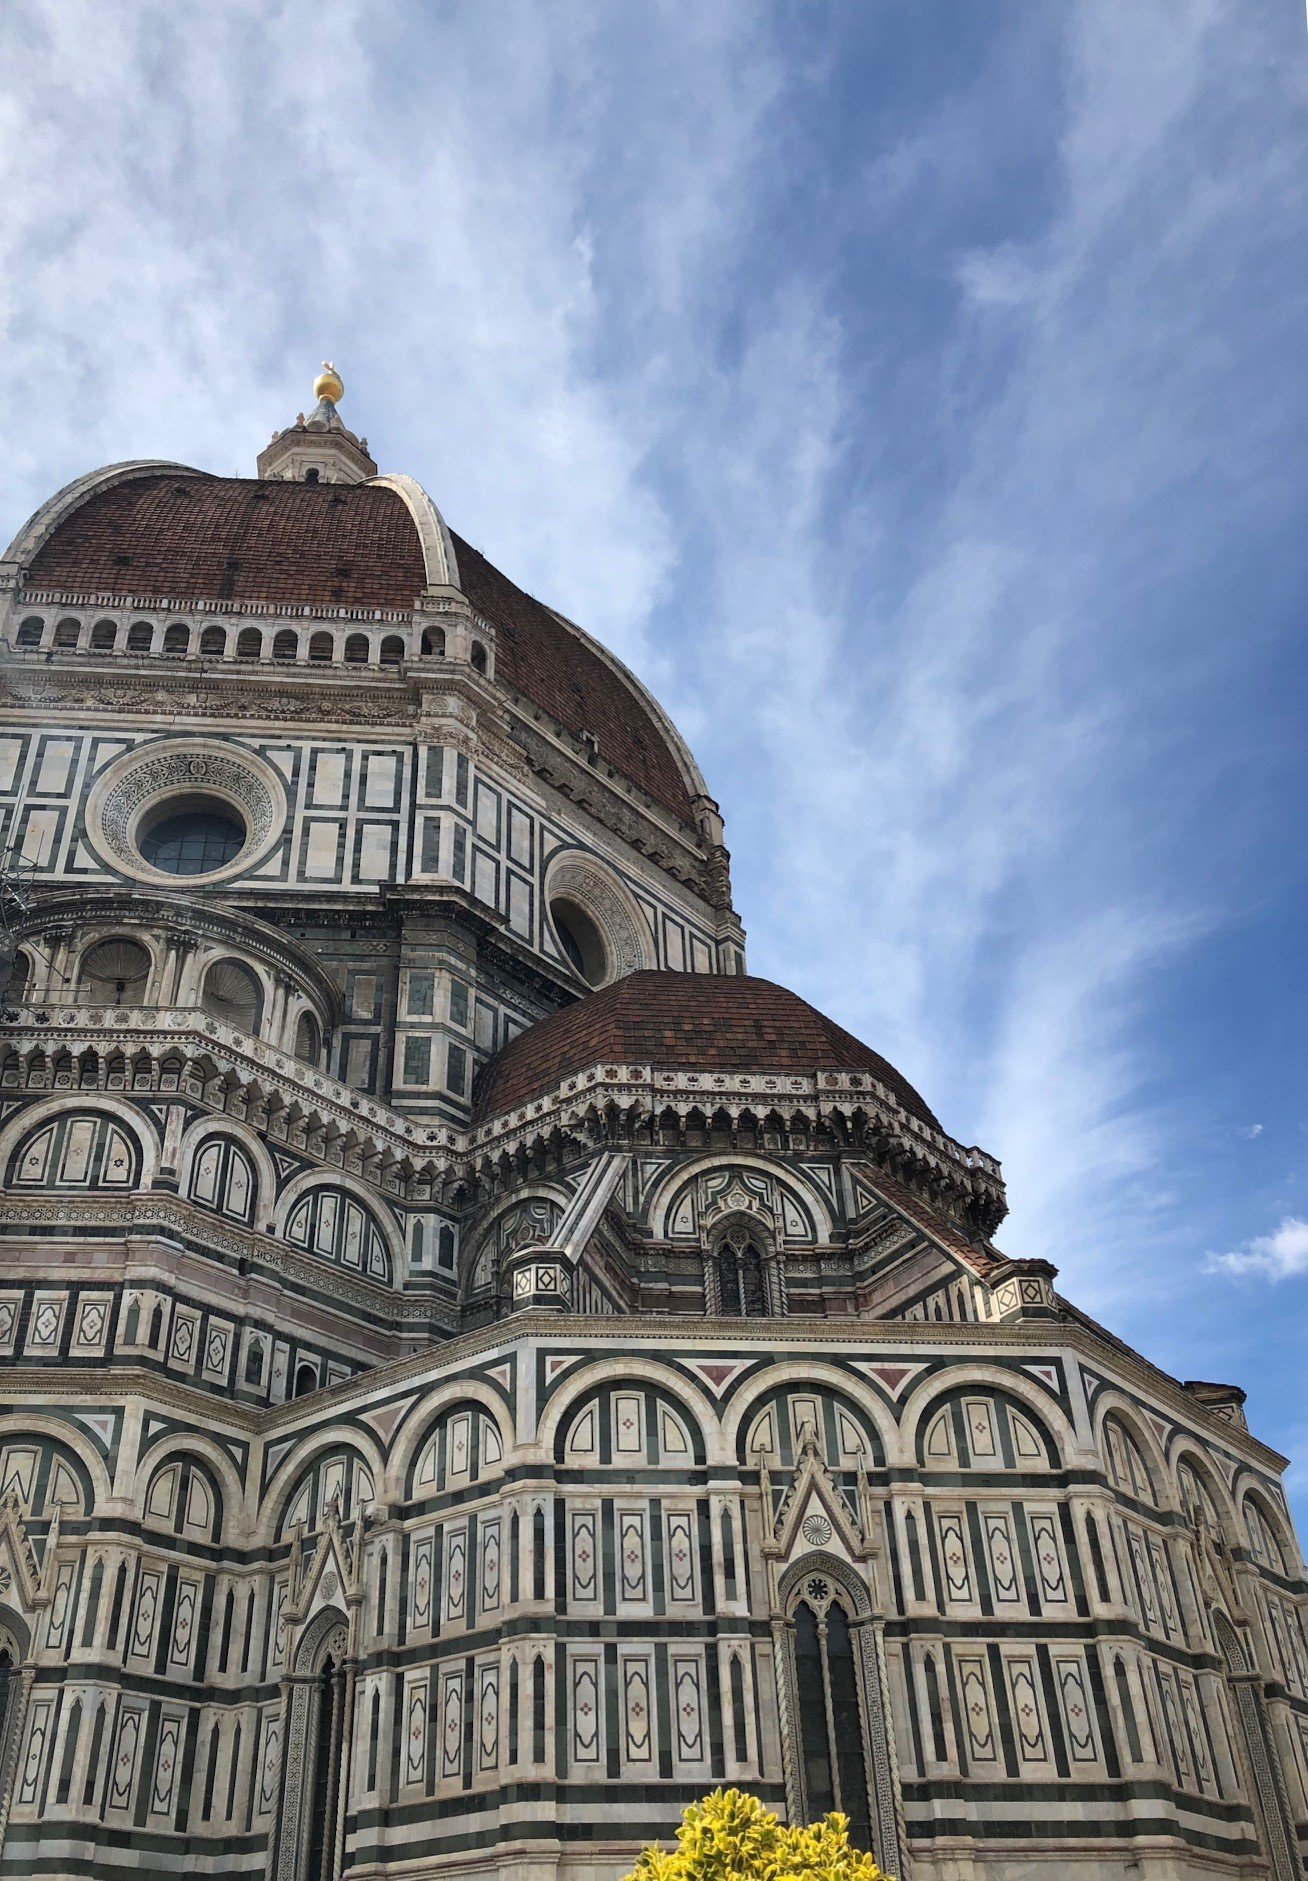 FIRENZE - Firenze: un museo a cielo aperto - 19 -20 Settembre 2020